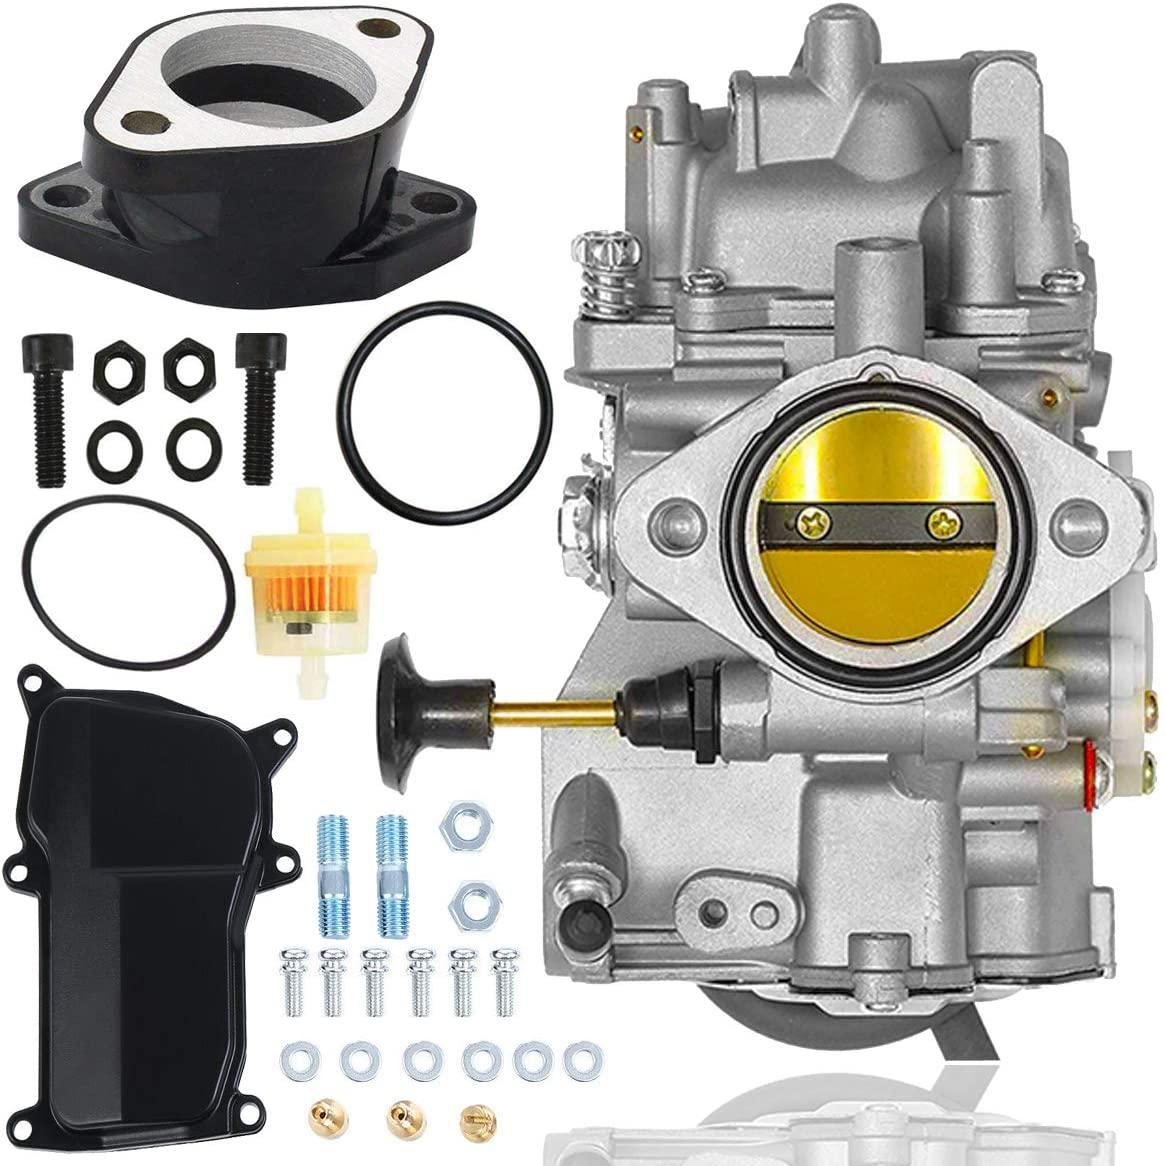 YFM350 Carburetor+Intake Manifold for ATV Yamaha Warrior 350 1987-2004/1987-1998 Big Bear 350 YFM350/1987-1990 & 1992-1995 Moto-4 350 YFM350